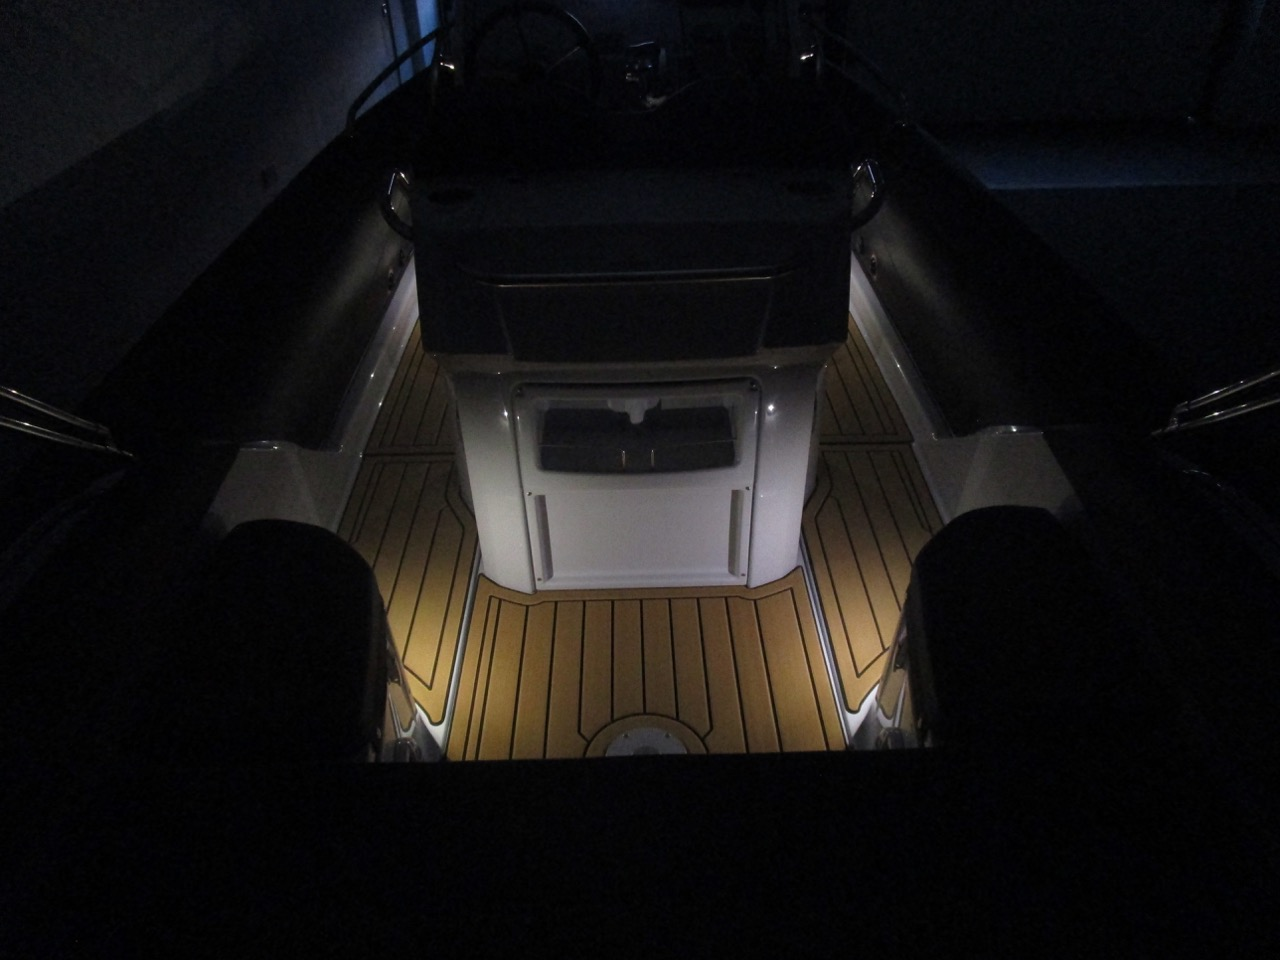 GRAND G750 RIB LED deck lights, stern